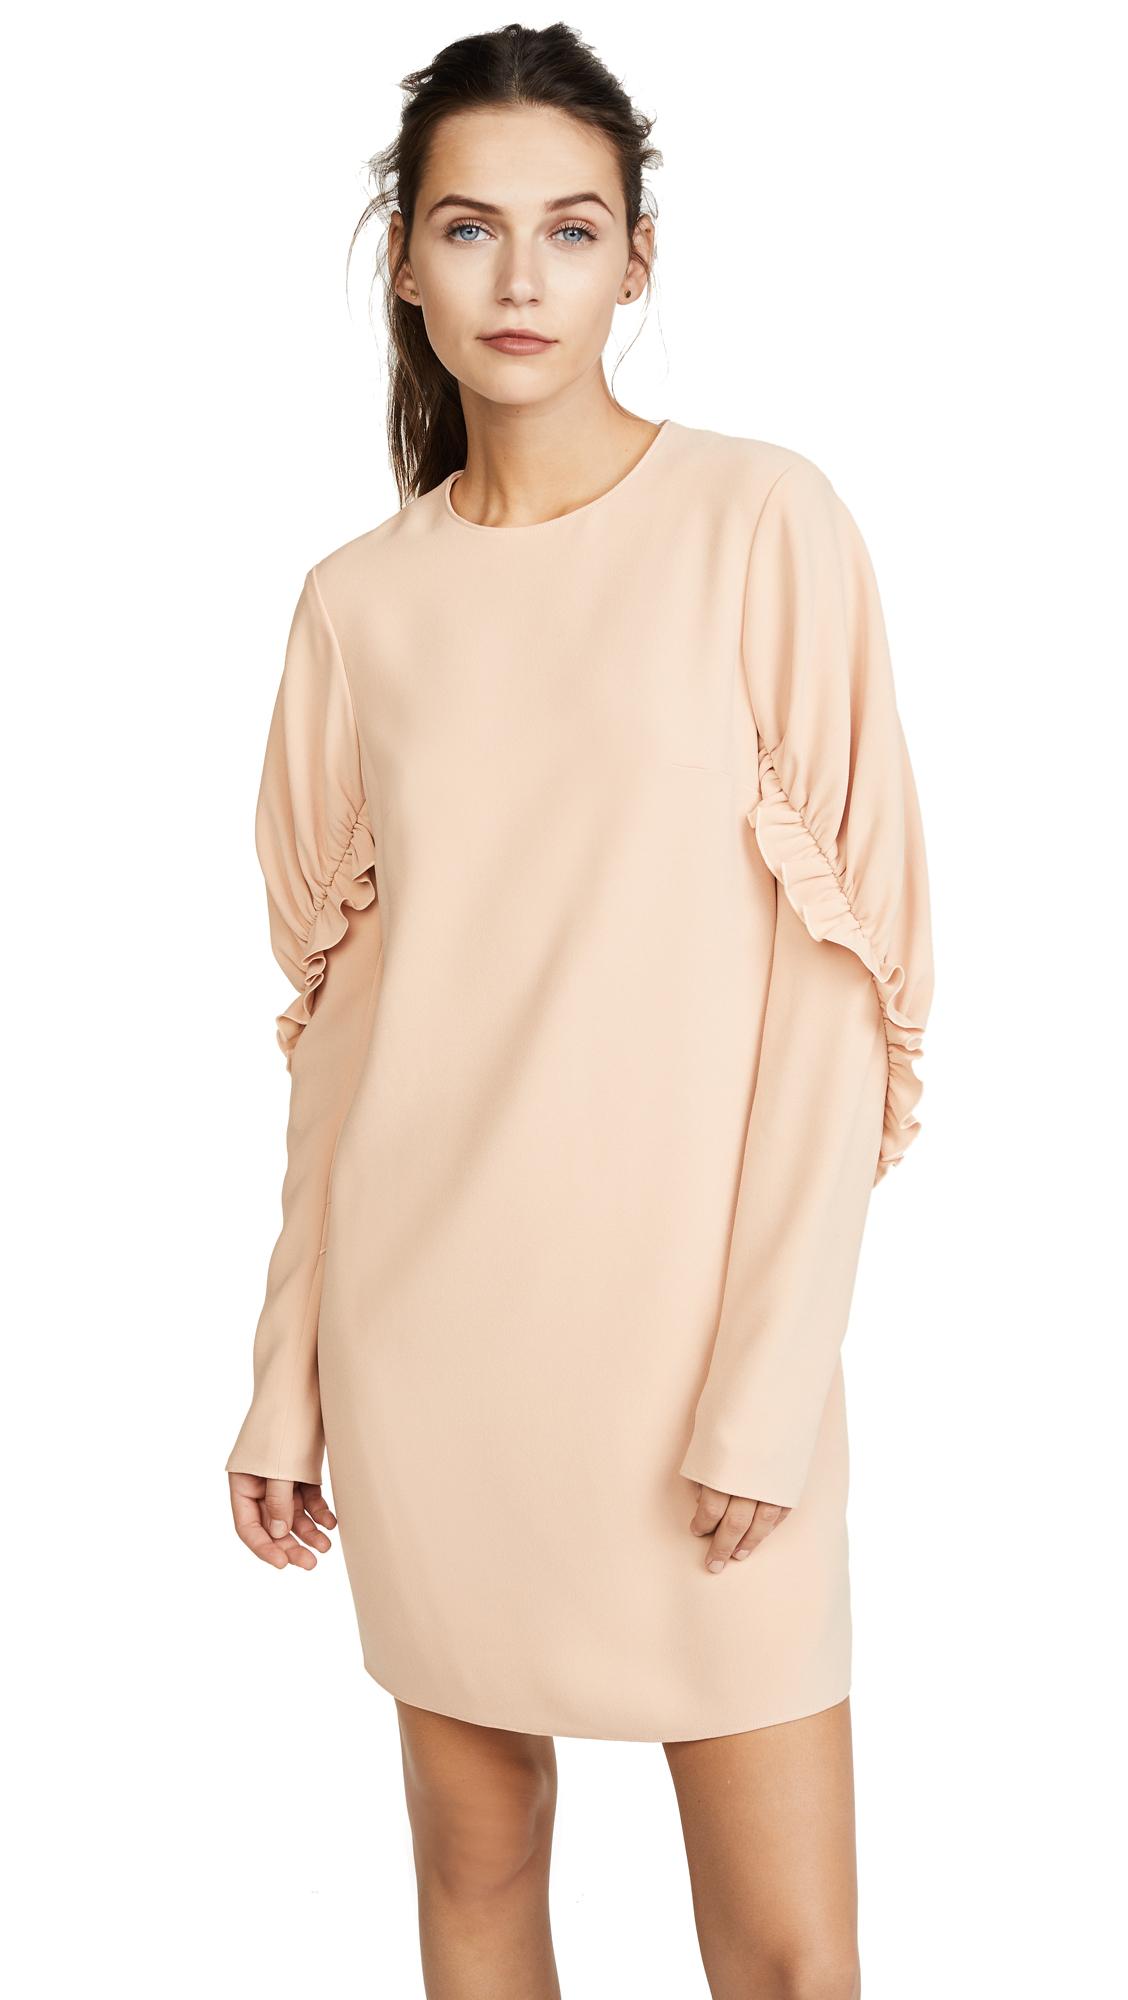 Tibi Short Ruffle Dress - Blush